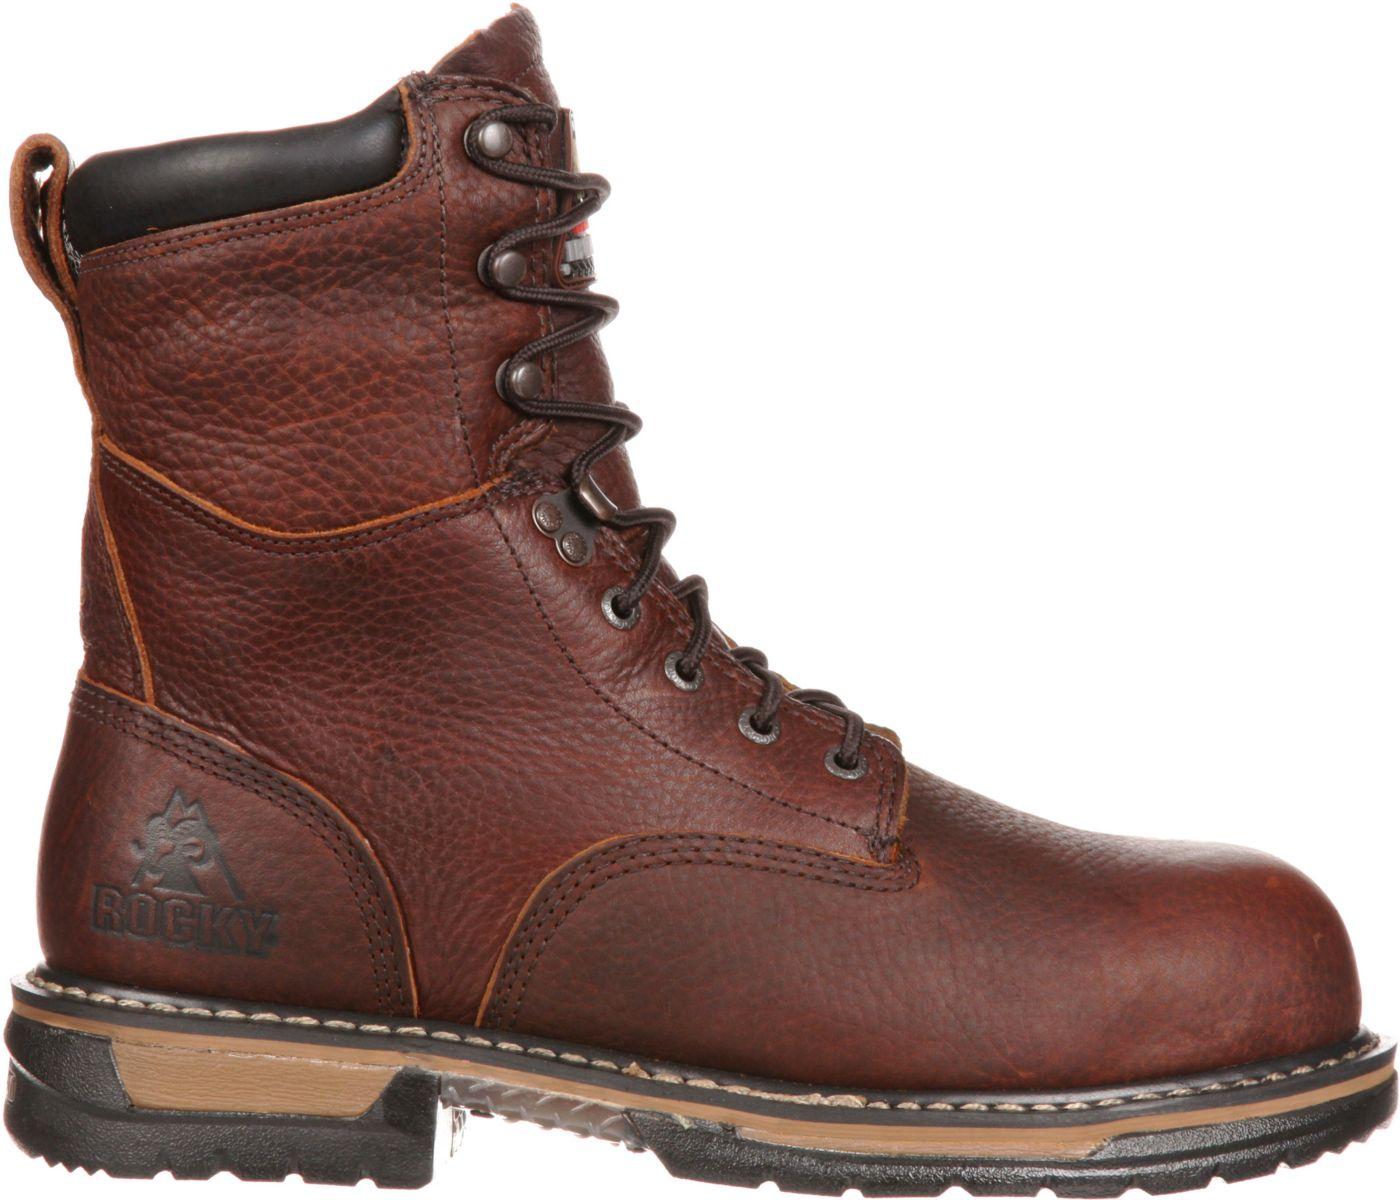 "Rocky Men's IronClad 8"" Waterproof Steel Toe Work Boots"